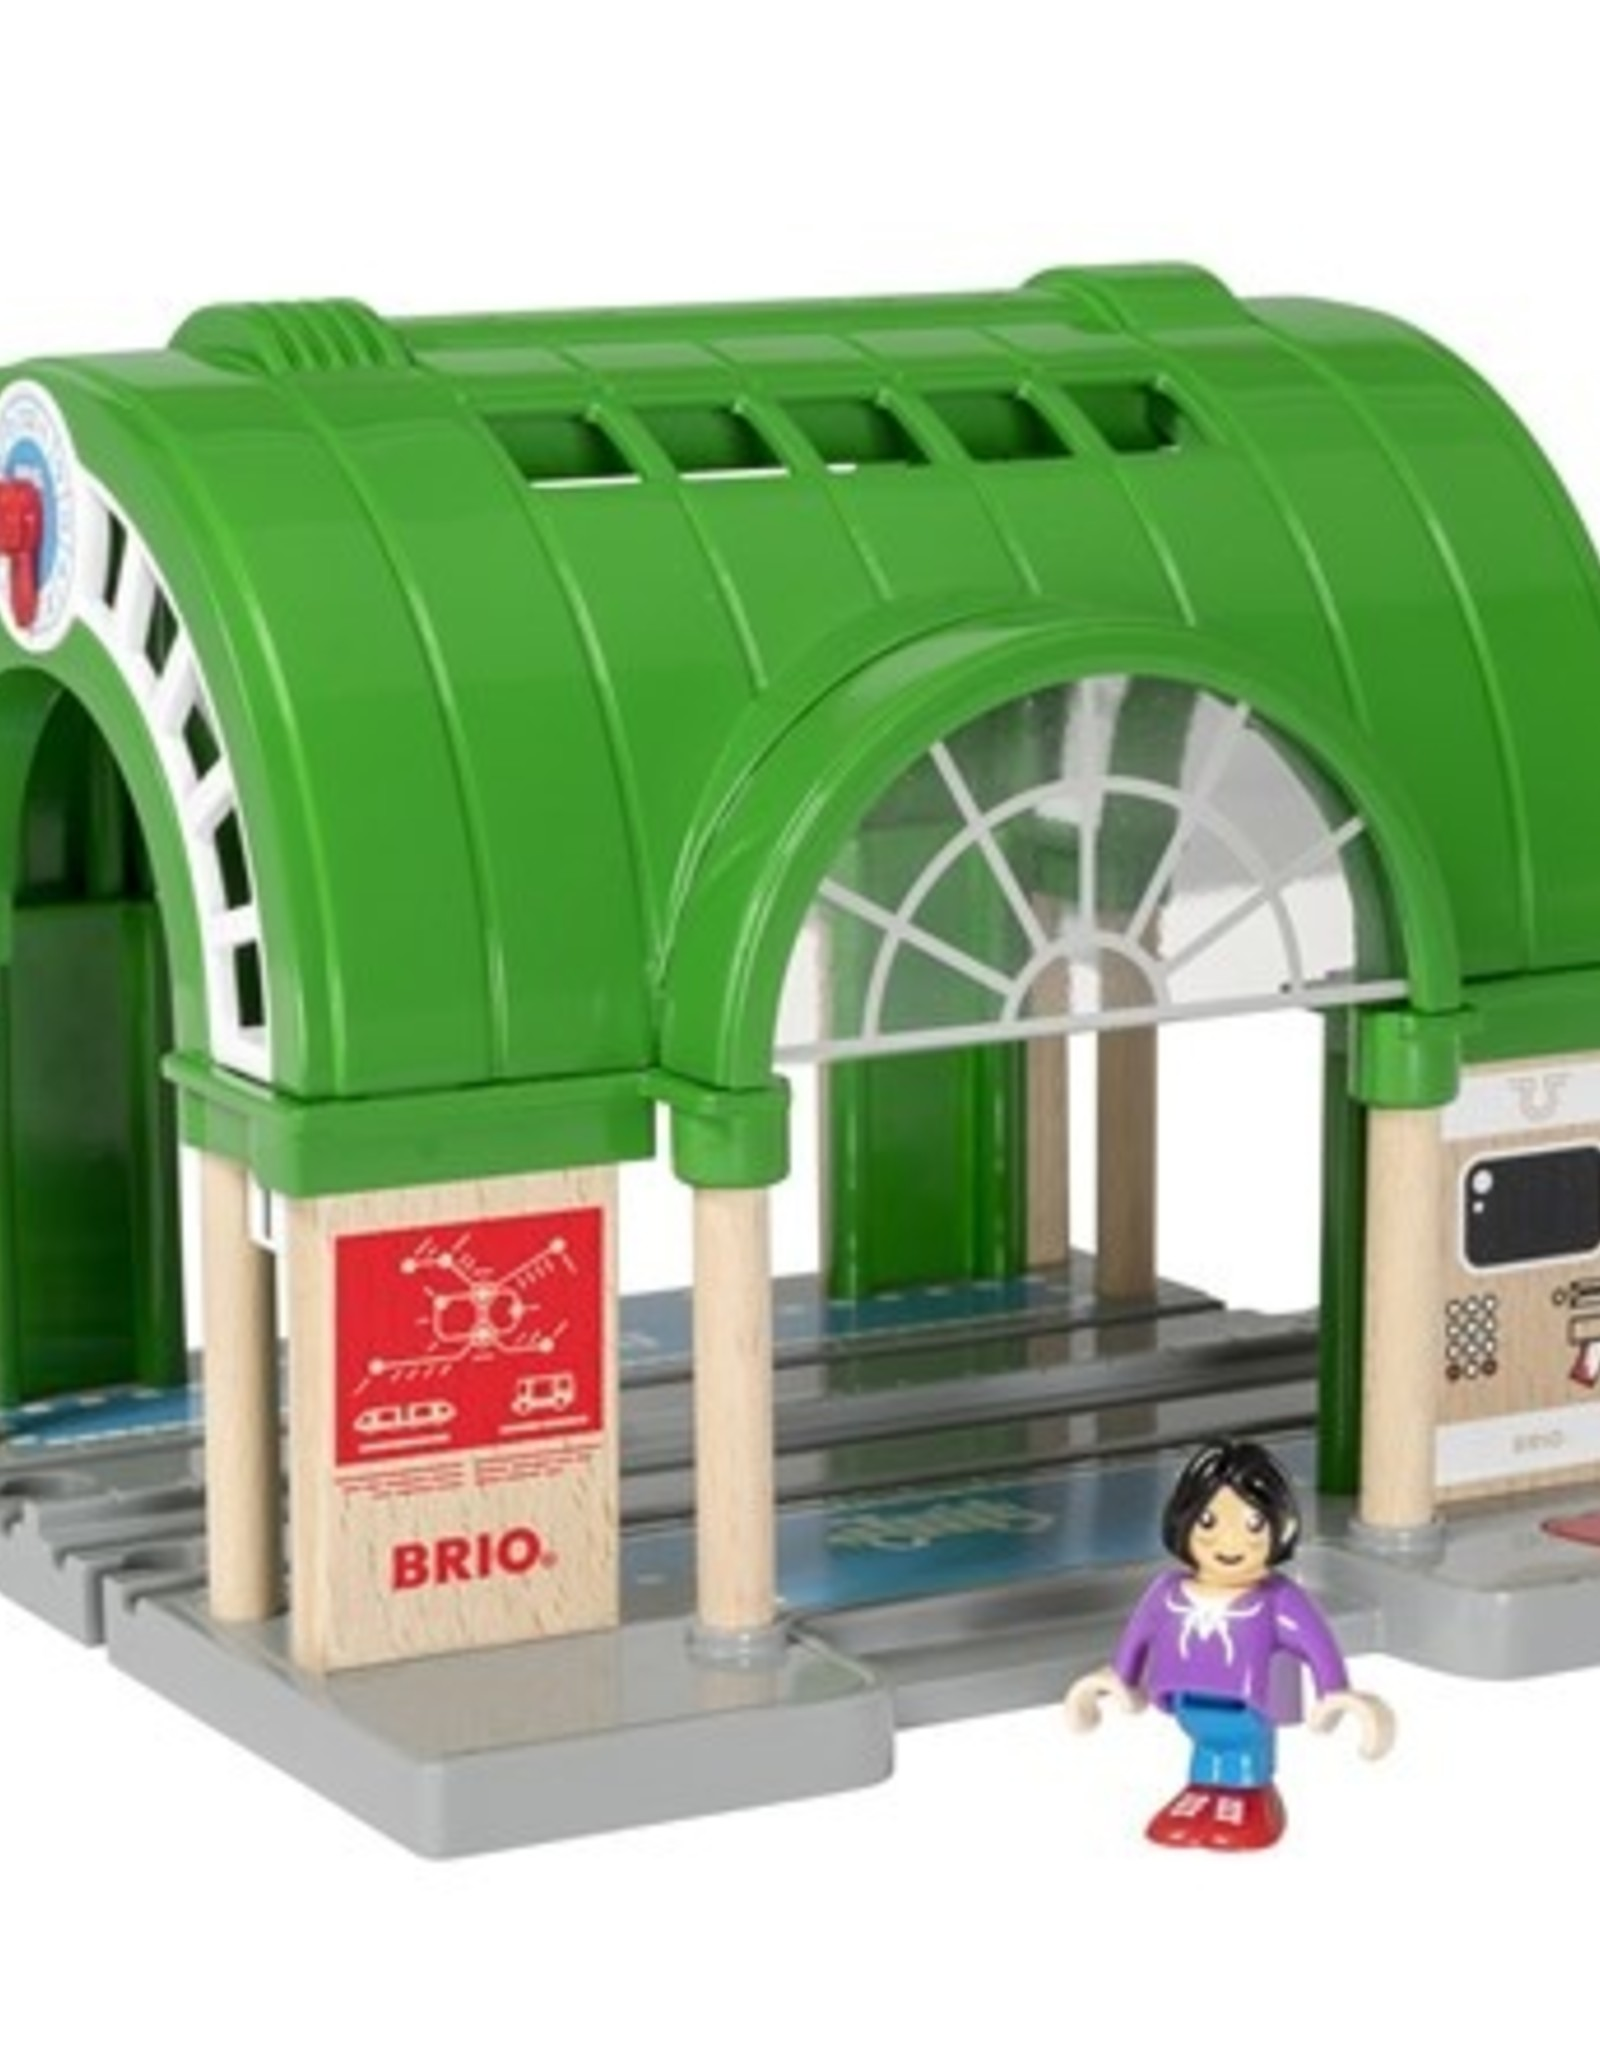 Brio Centraal treinstation